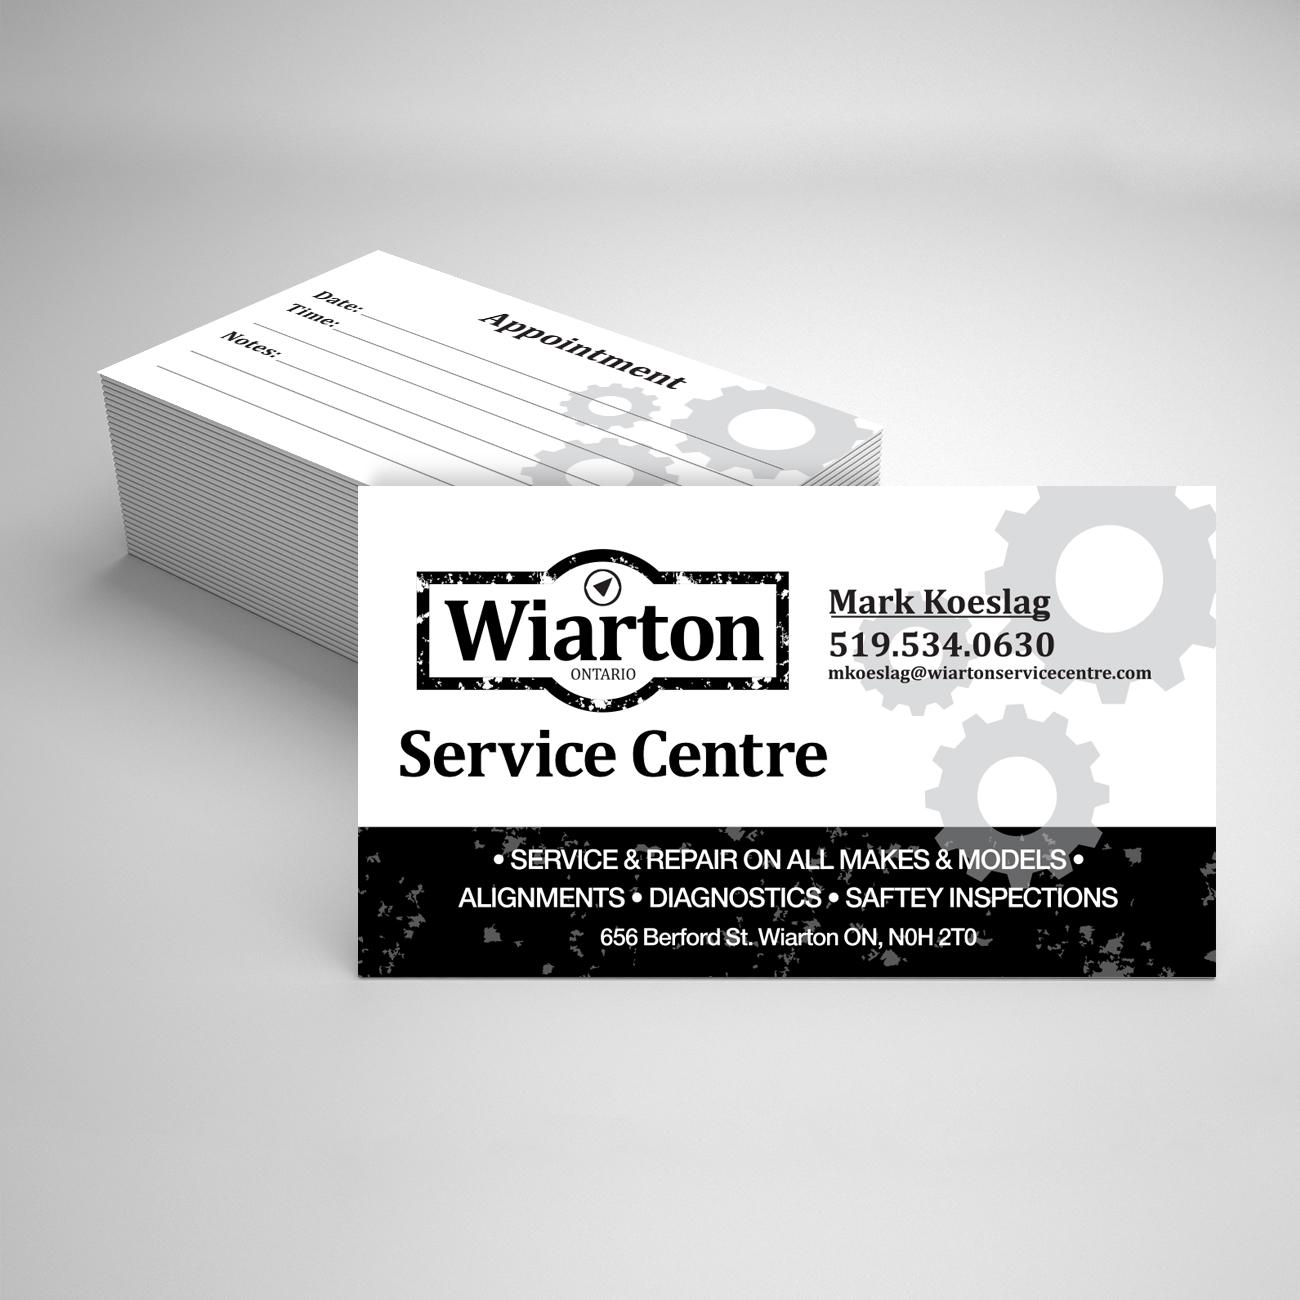 Wiarton Service Centre business cards